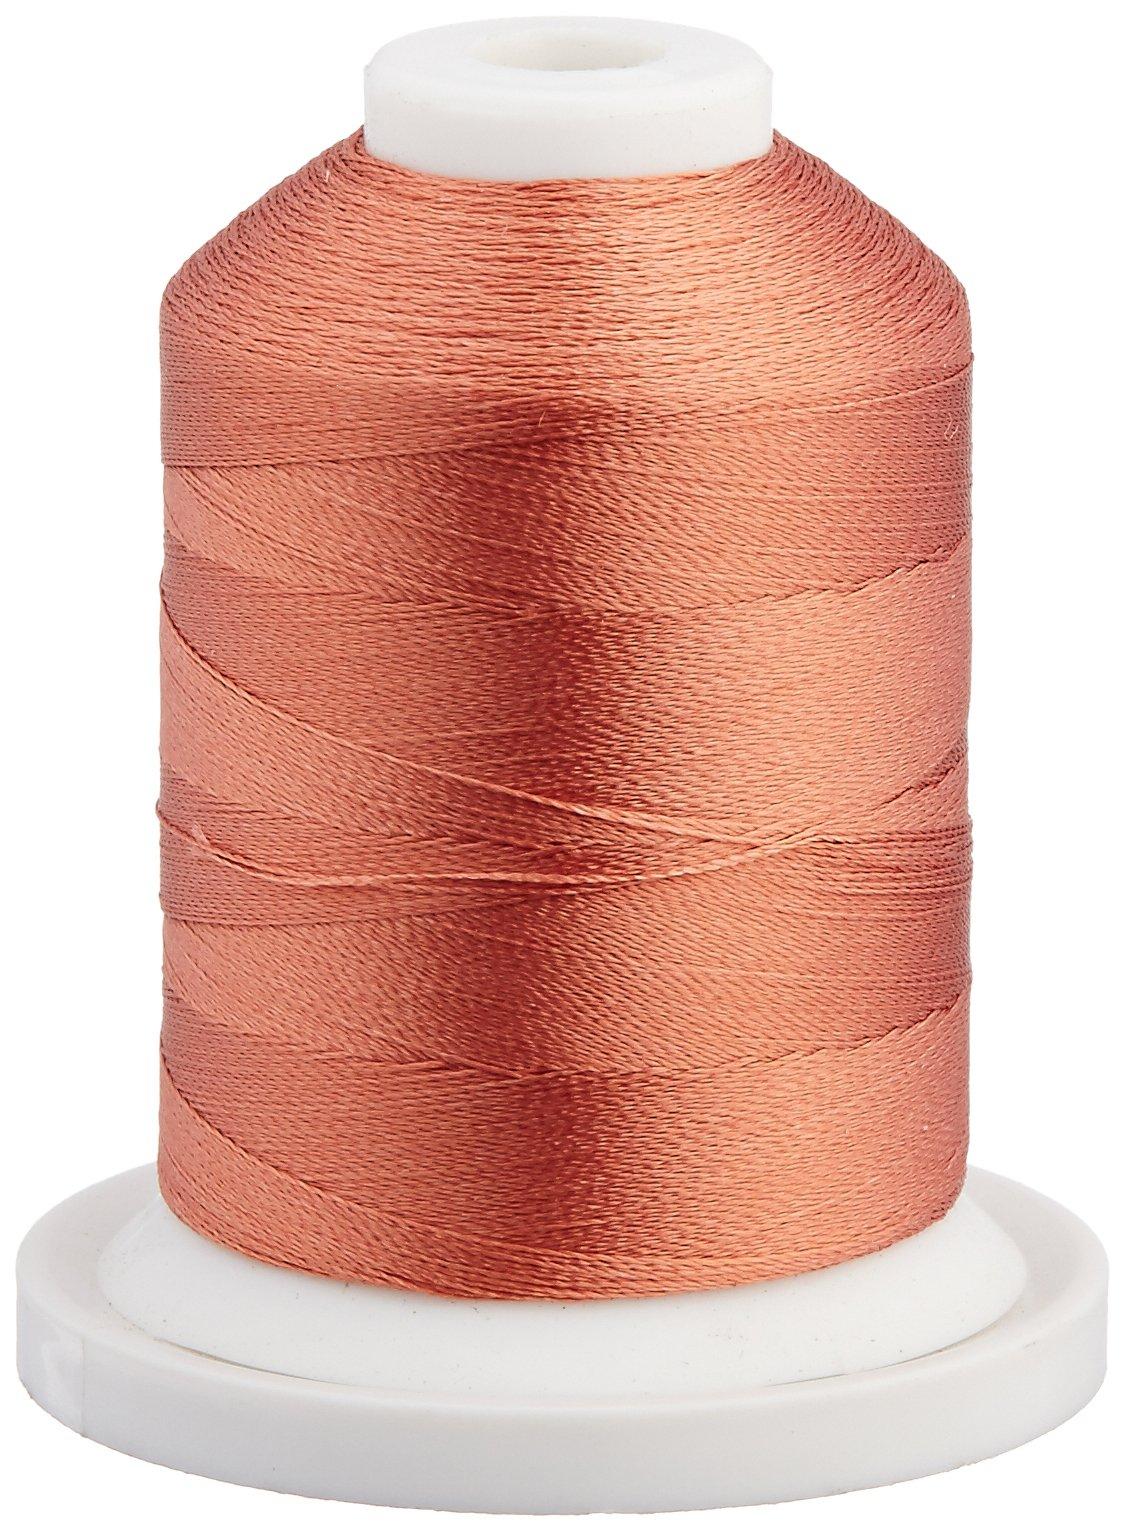 Robison-Anton Rayon Super Strength Thread, 1100-Yard, Pro-Cinnamon